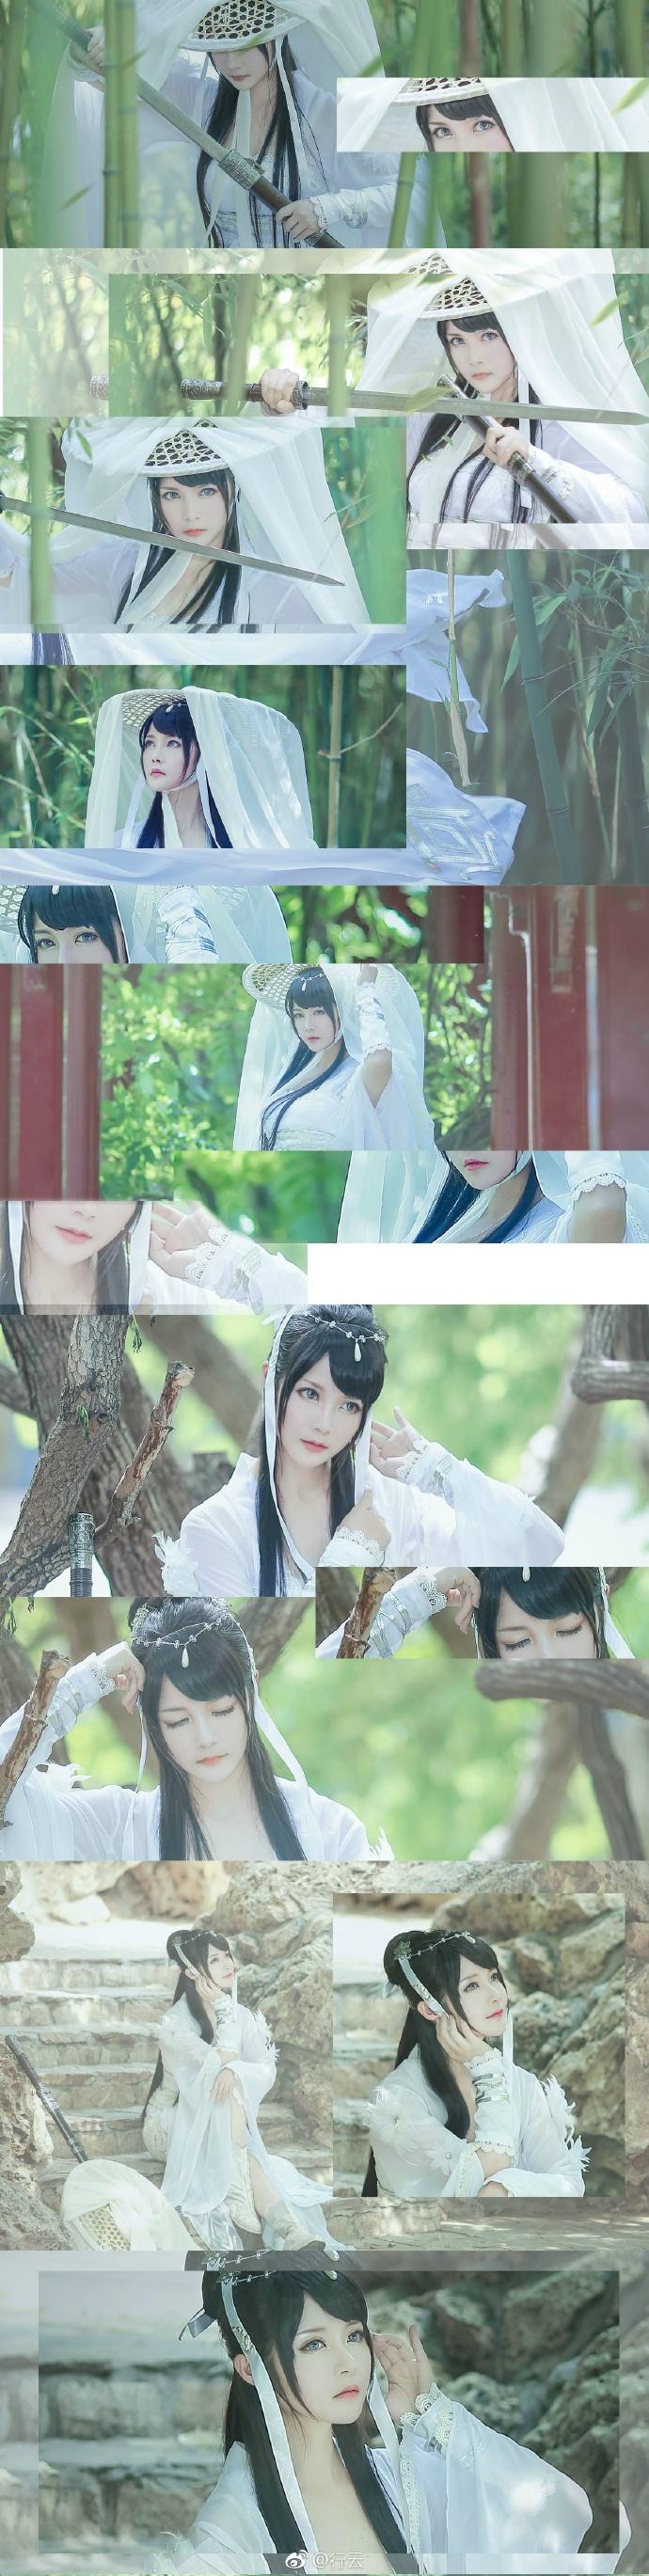 【cos正片】天涯明月刀OL---素问·太白-cos欣赏 cn:行云 cosplay-第3张